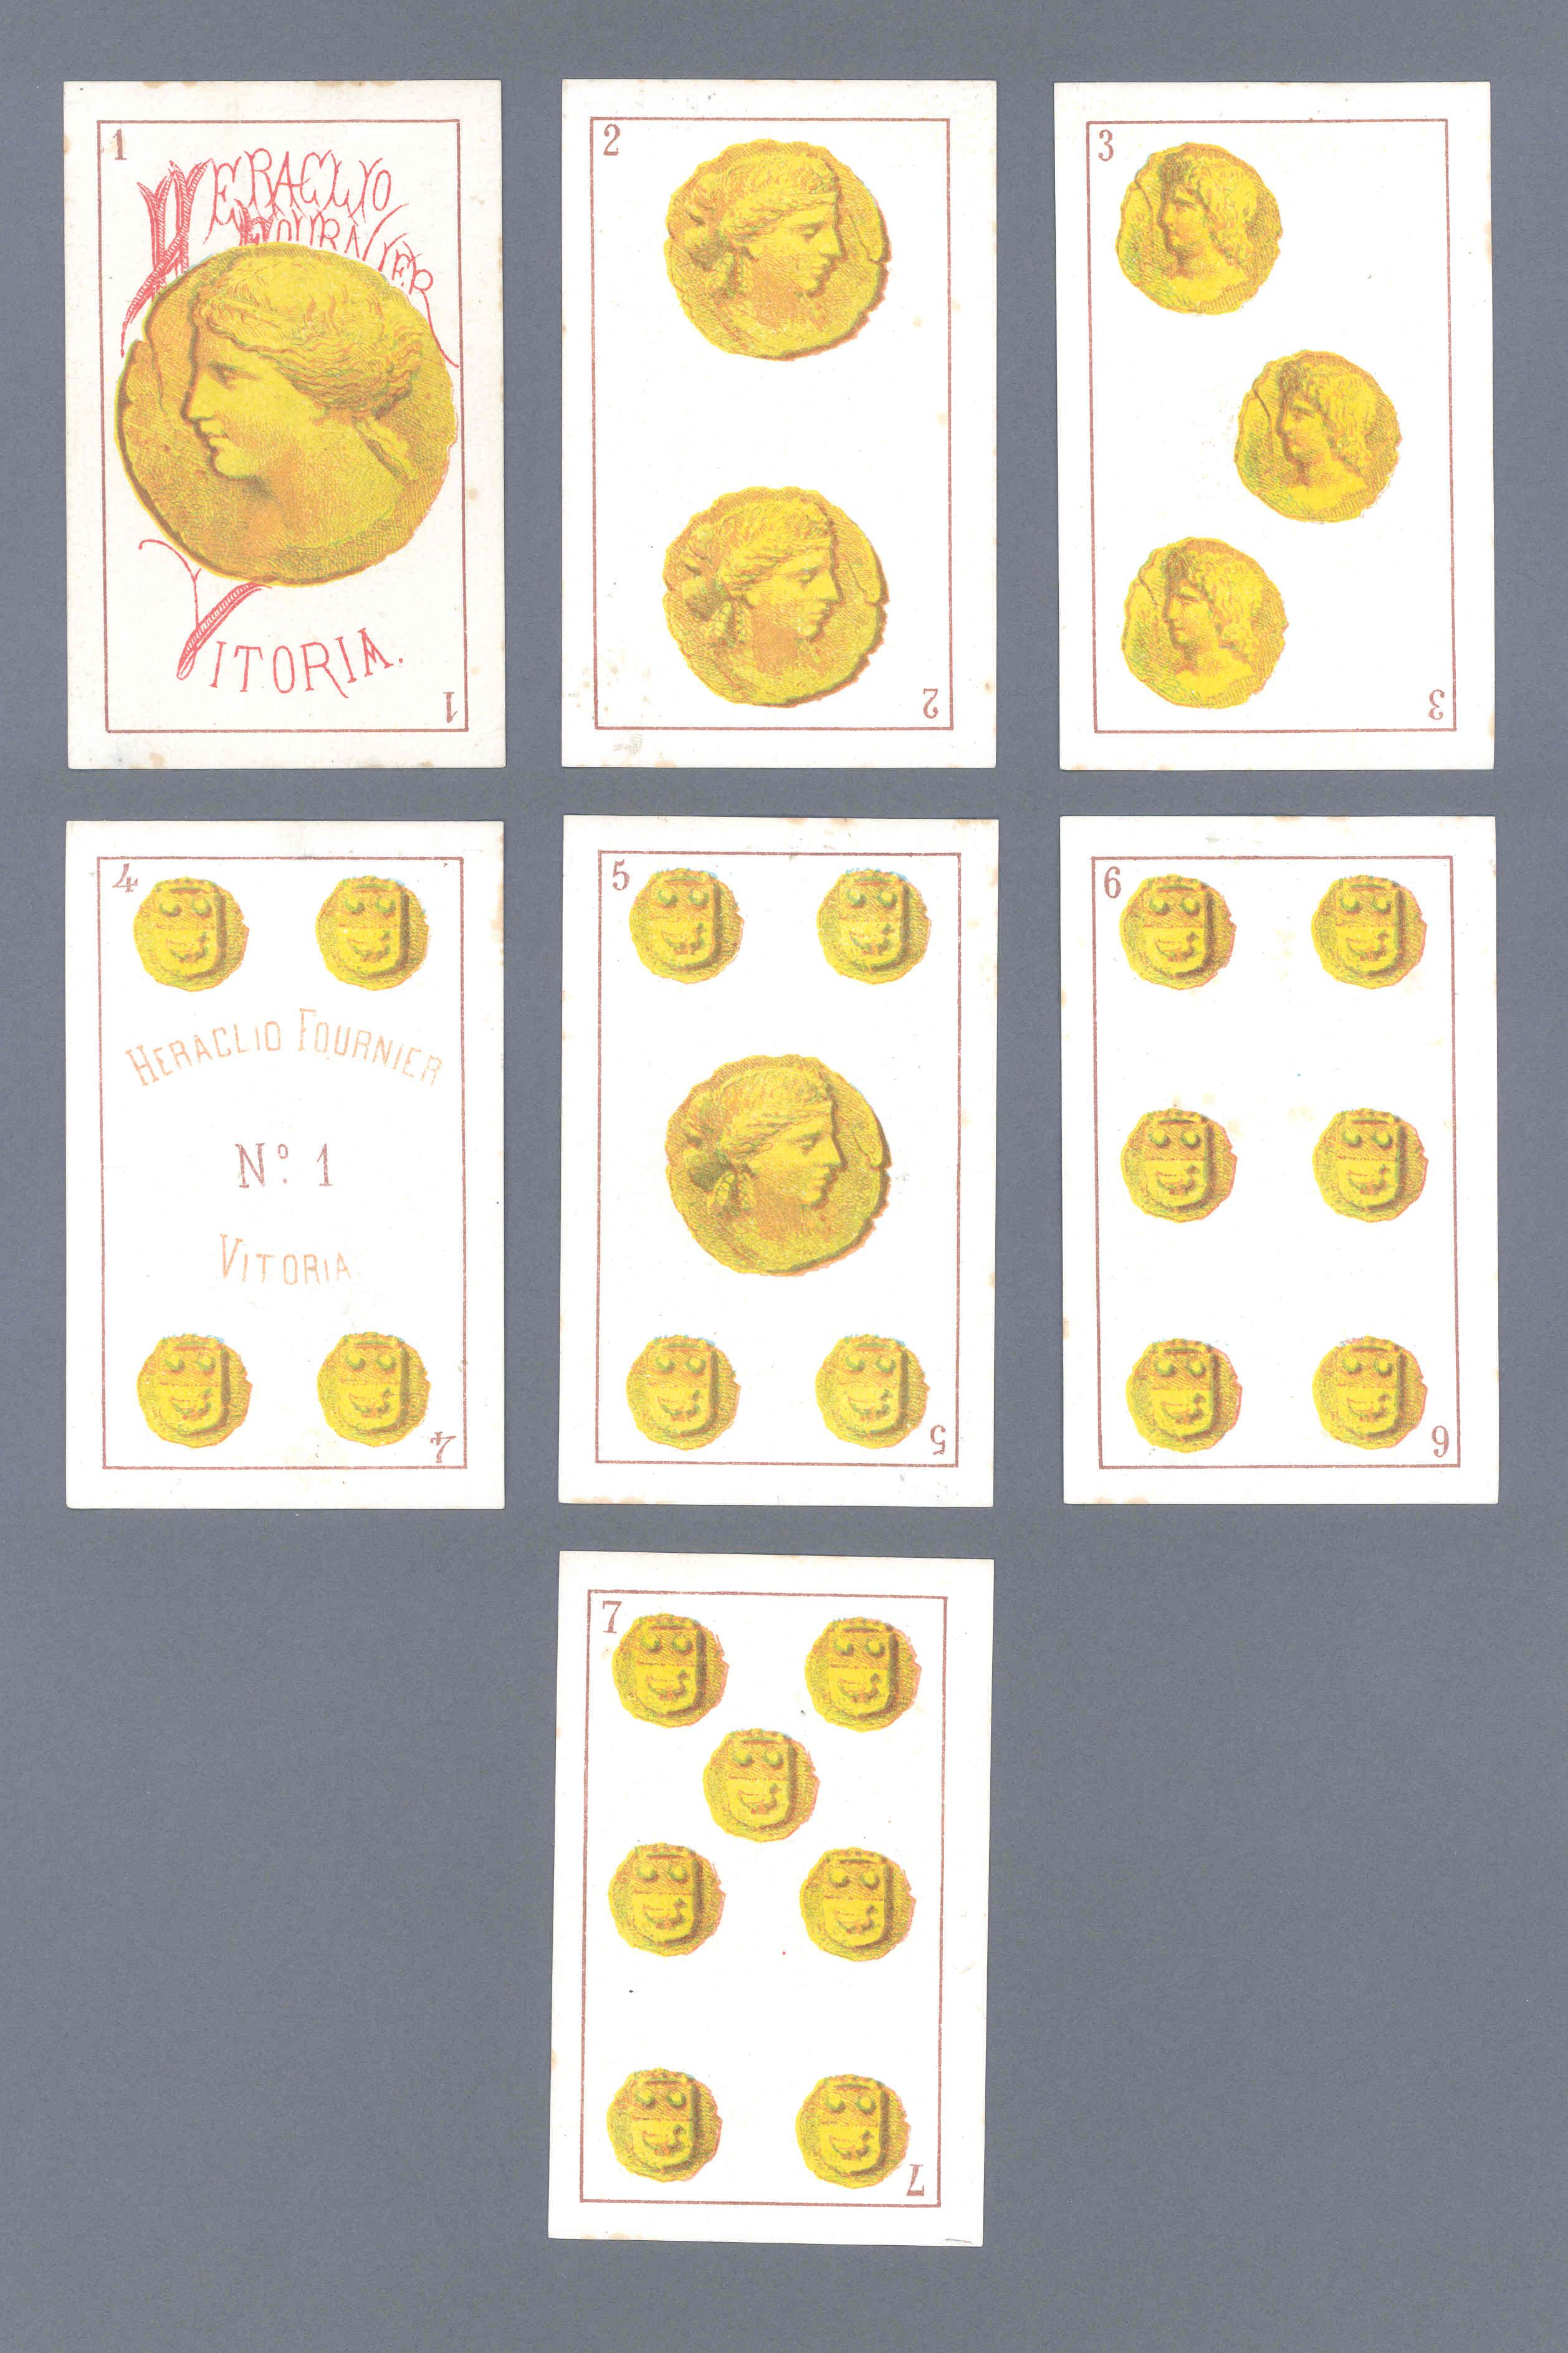 Baraja Nº 1 impresa en litografía por Fournier en Vitoria